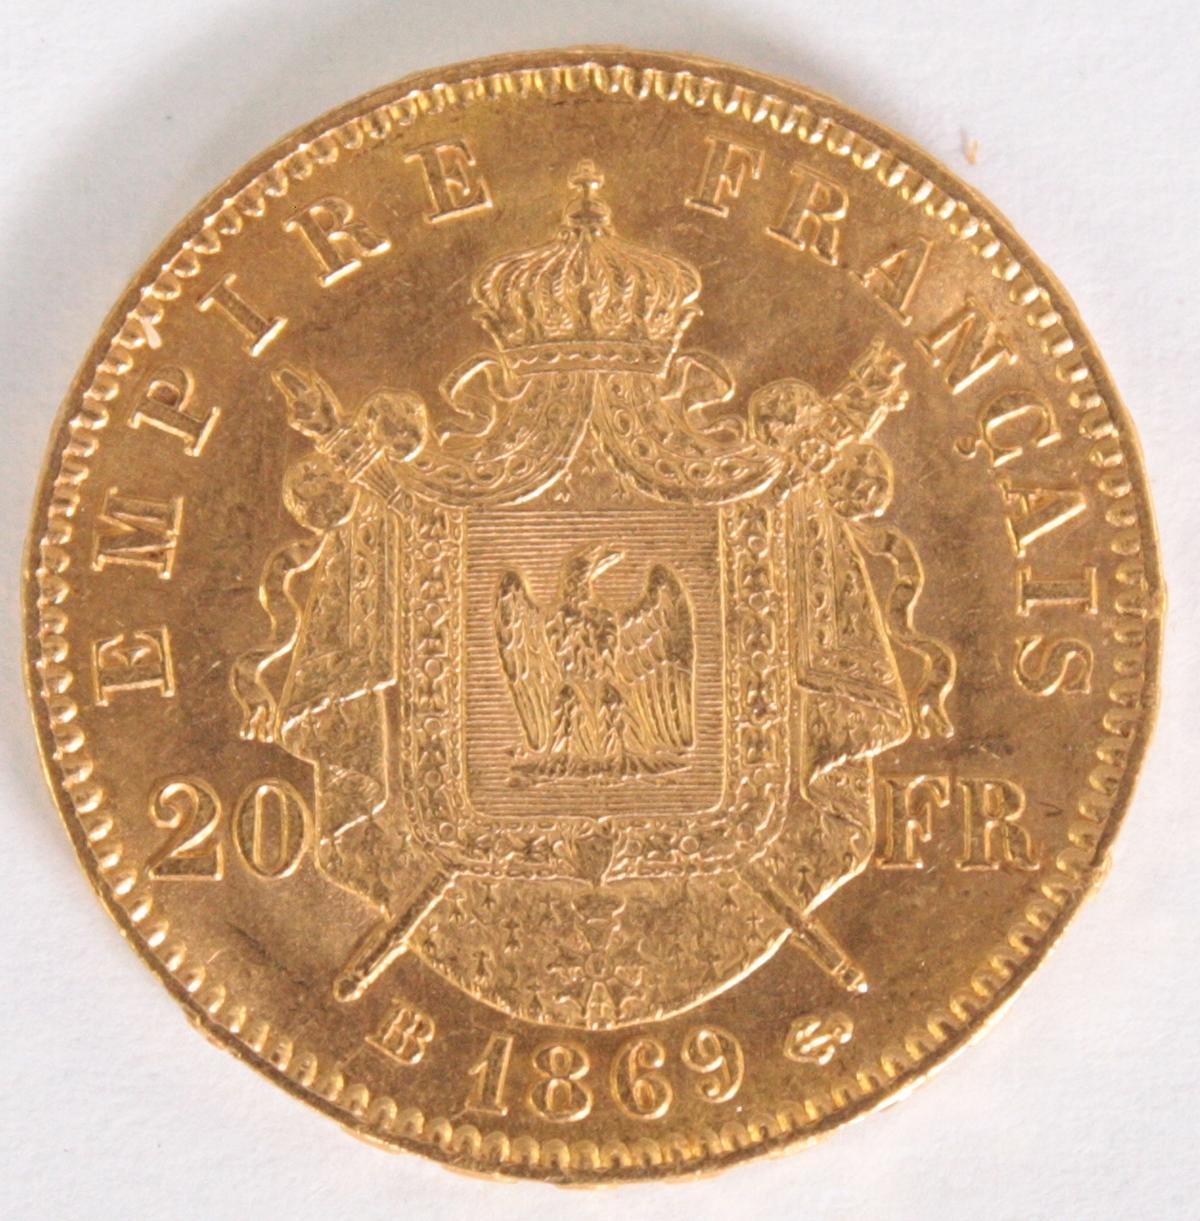 Frankreich, 20 Francs 1869, Napoleon III-2